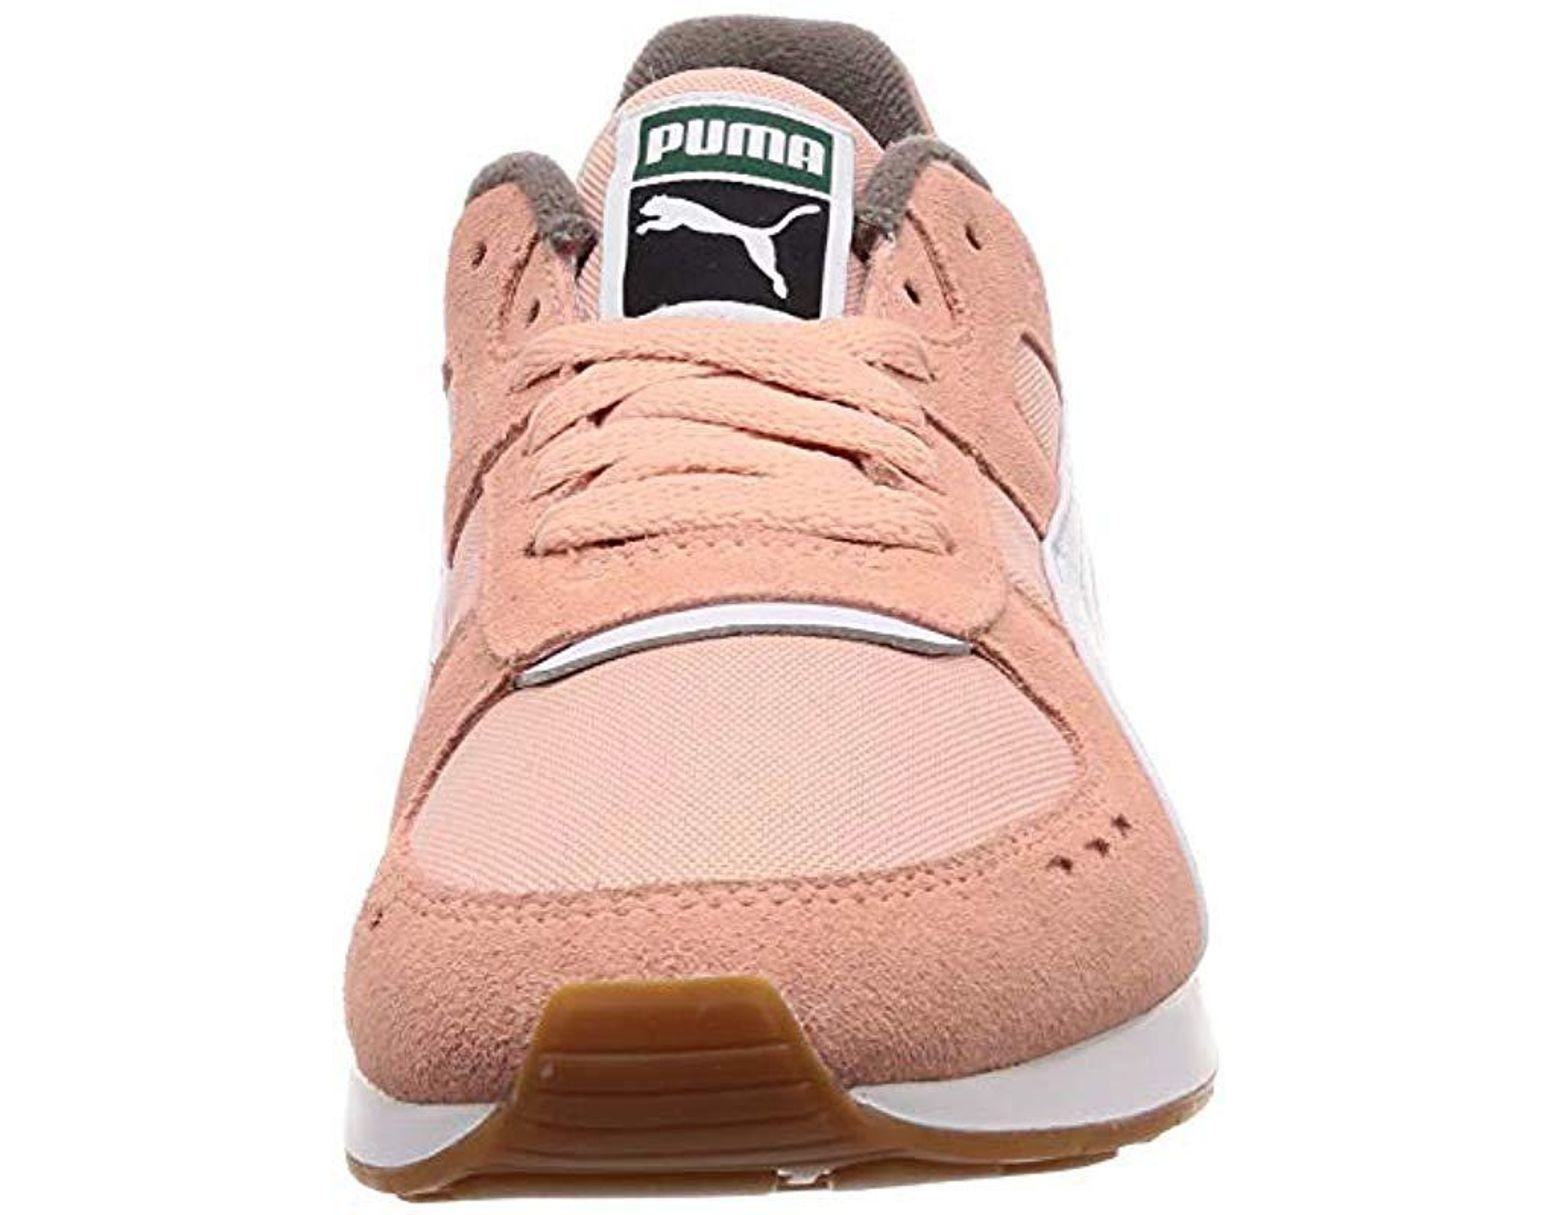 Rs 150 Para Nylon Color Wn'sZapatillas De Lyst Mujer Puma Rosa odBWrCxe